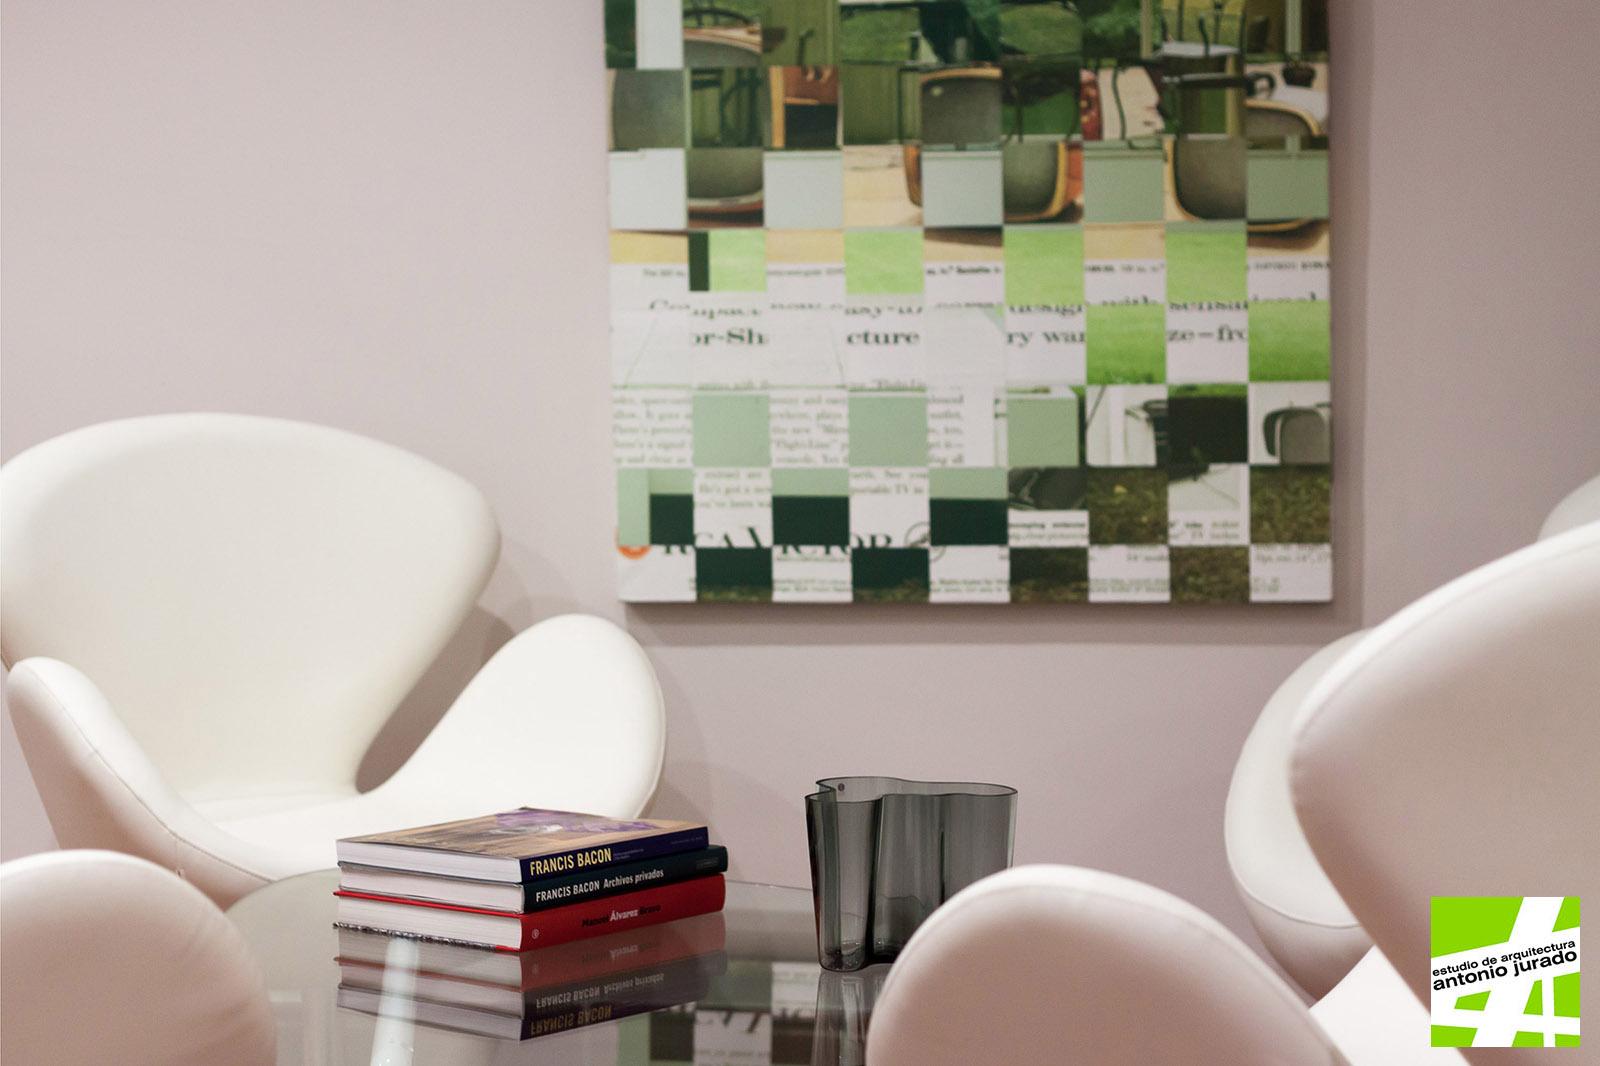 interiorismo-reforma-diseño-vivienda-torrox-park-malaga-antonio-jurado-arquitecto-05